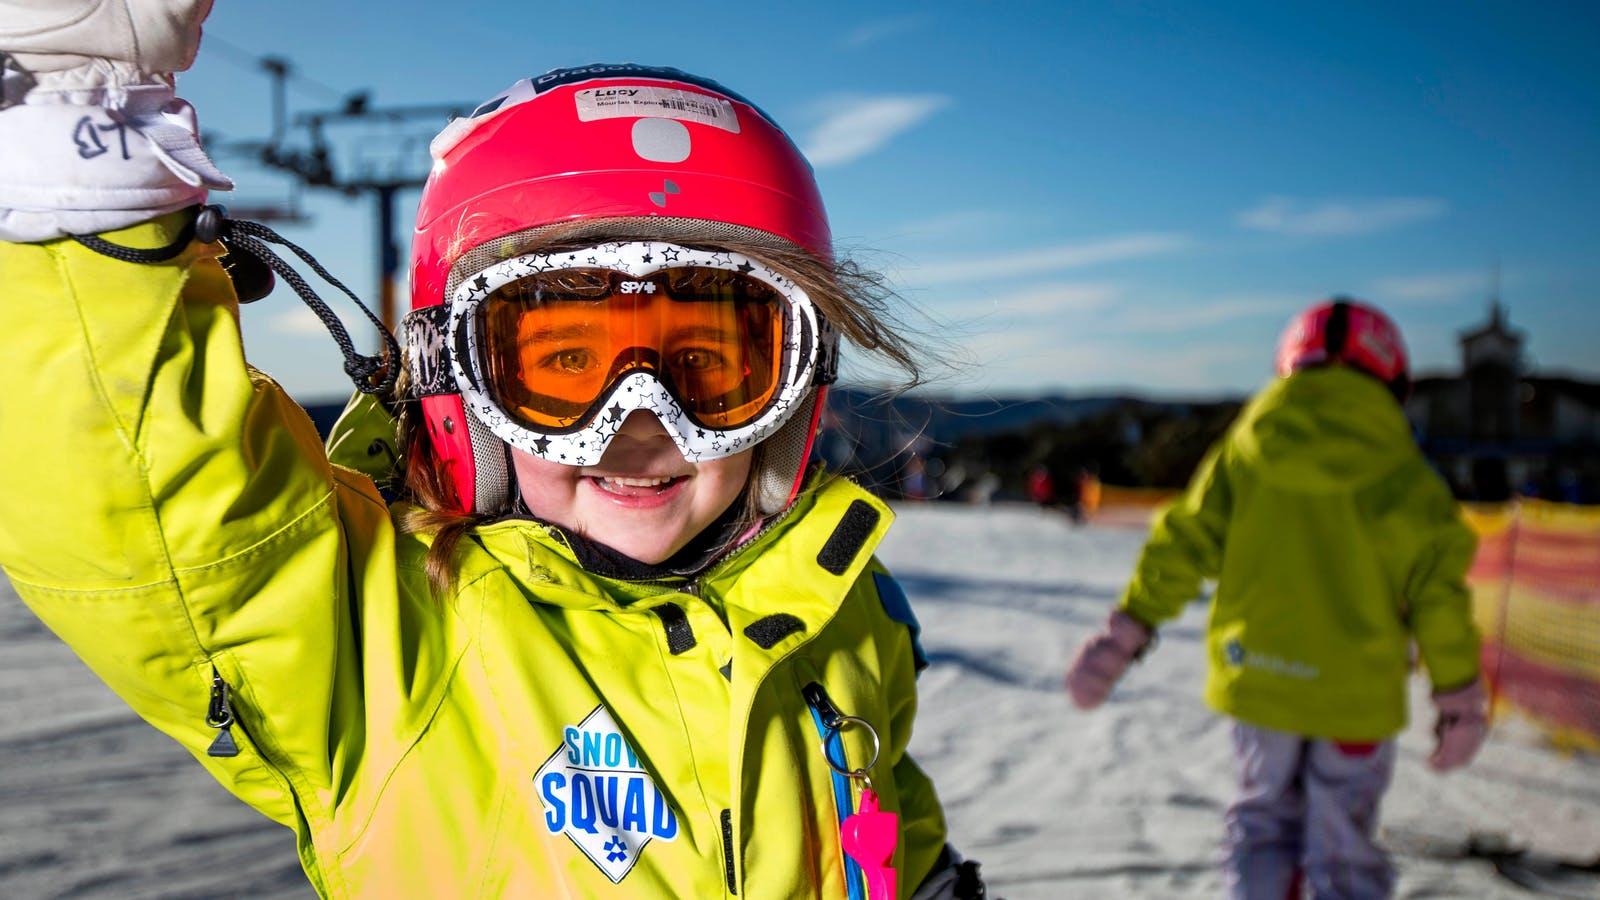 Kids enjoying the Snow Squad programs